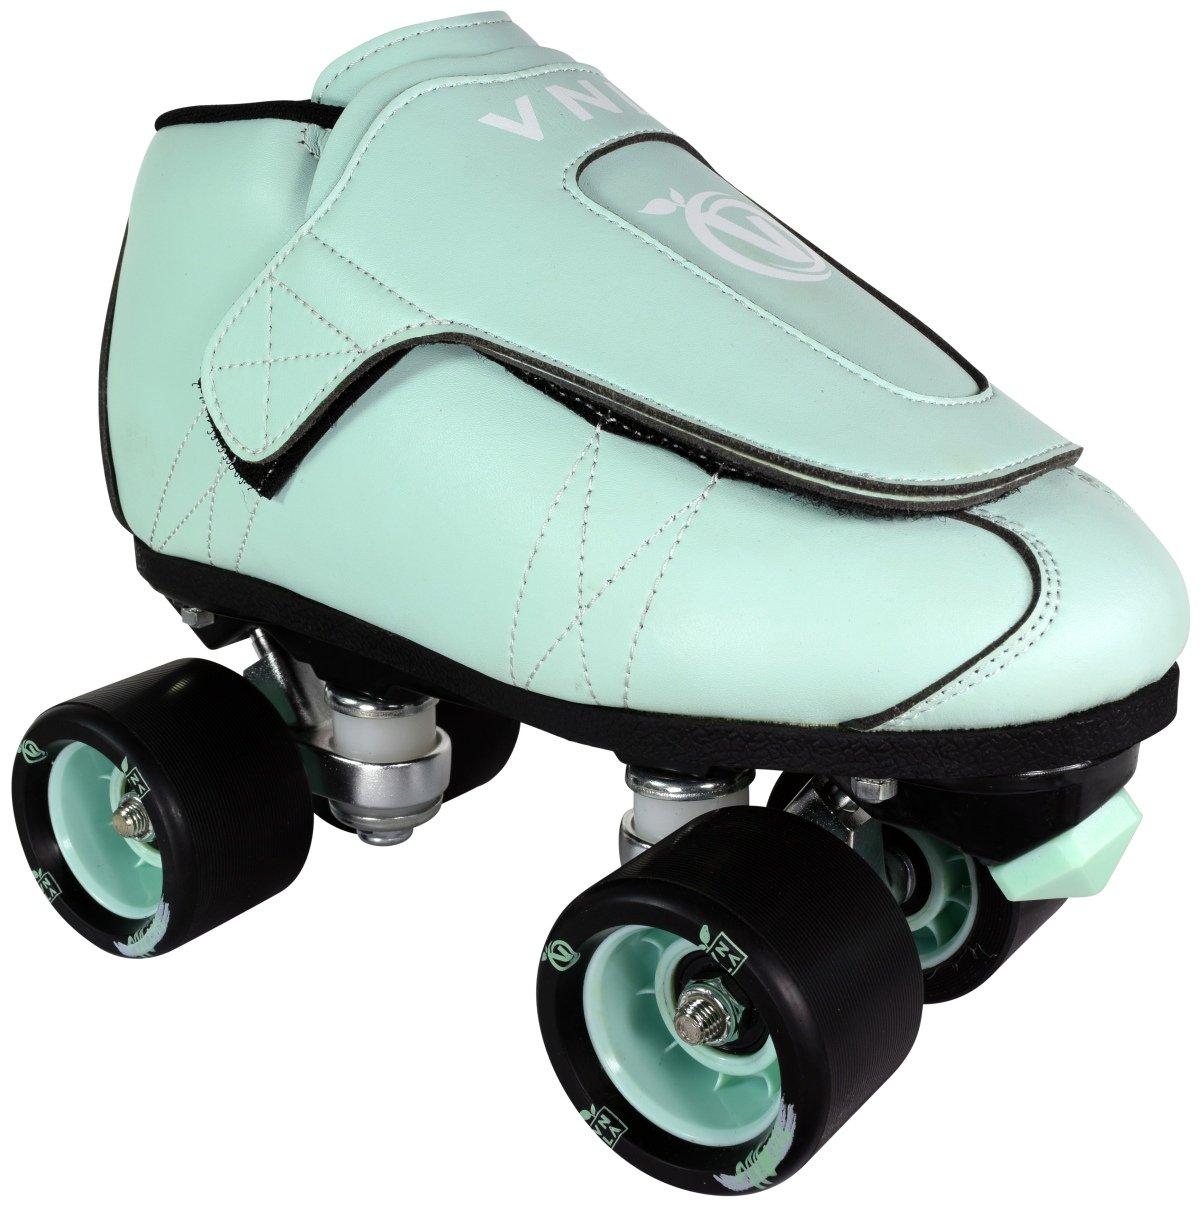 VNLA Mint Jam スケート靴 メンズ&レディース スケート靴 – ローラースケート レディース&メンズ – 調節可能なローラースケート/ローラースケート – アウトドア&インドア大人用スケート – キッズ/キッズスケート(ミントグリーン)  Kids 3